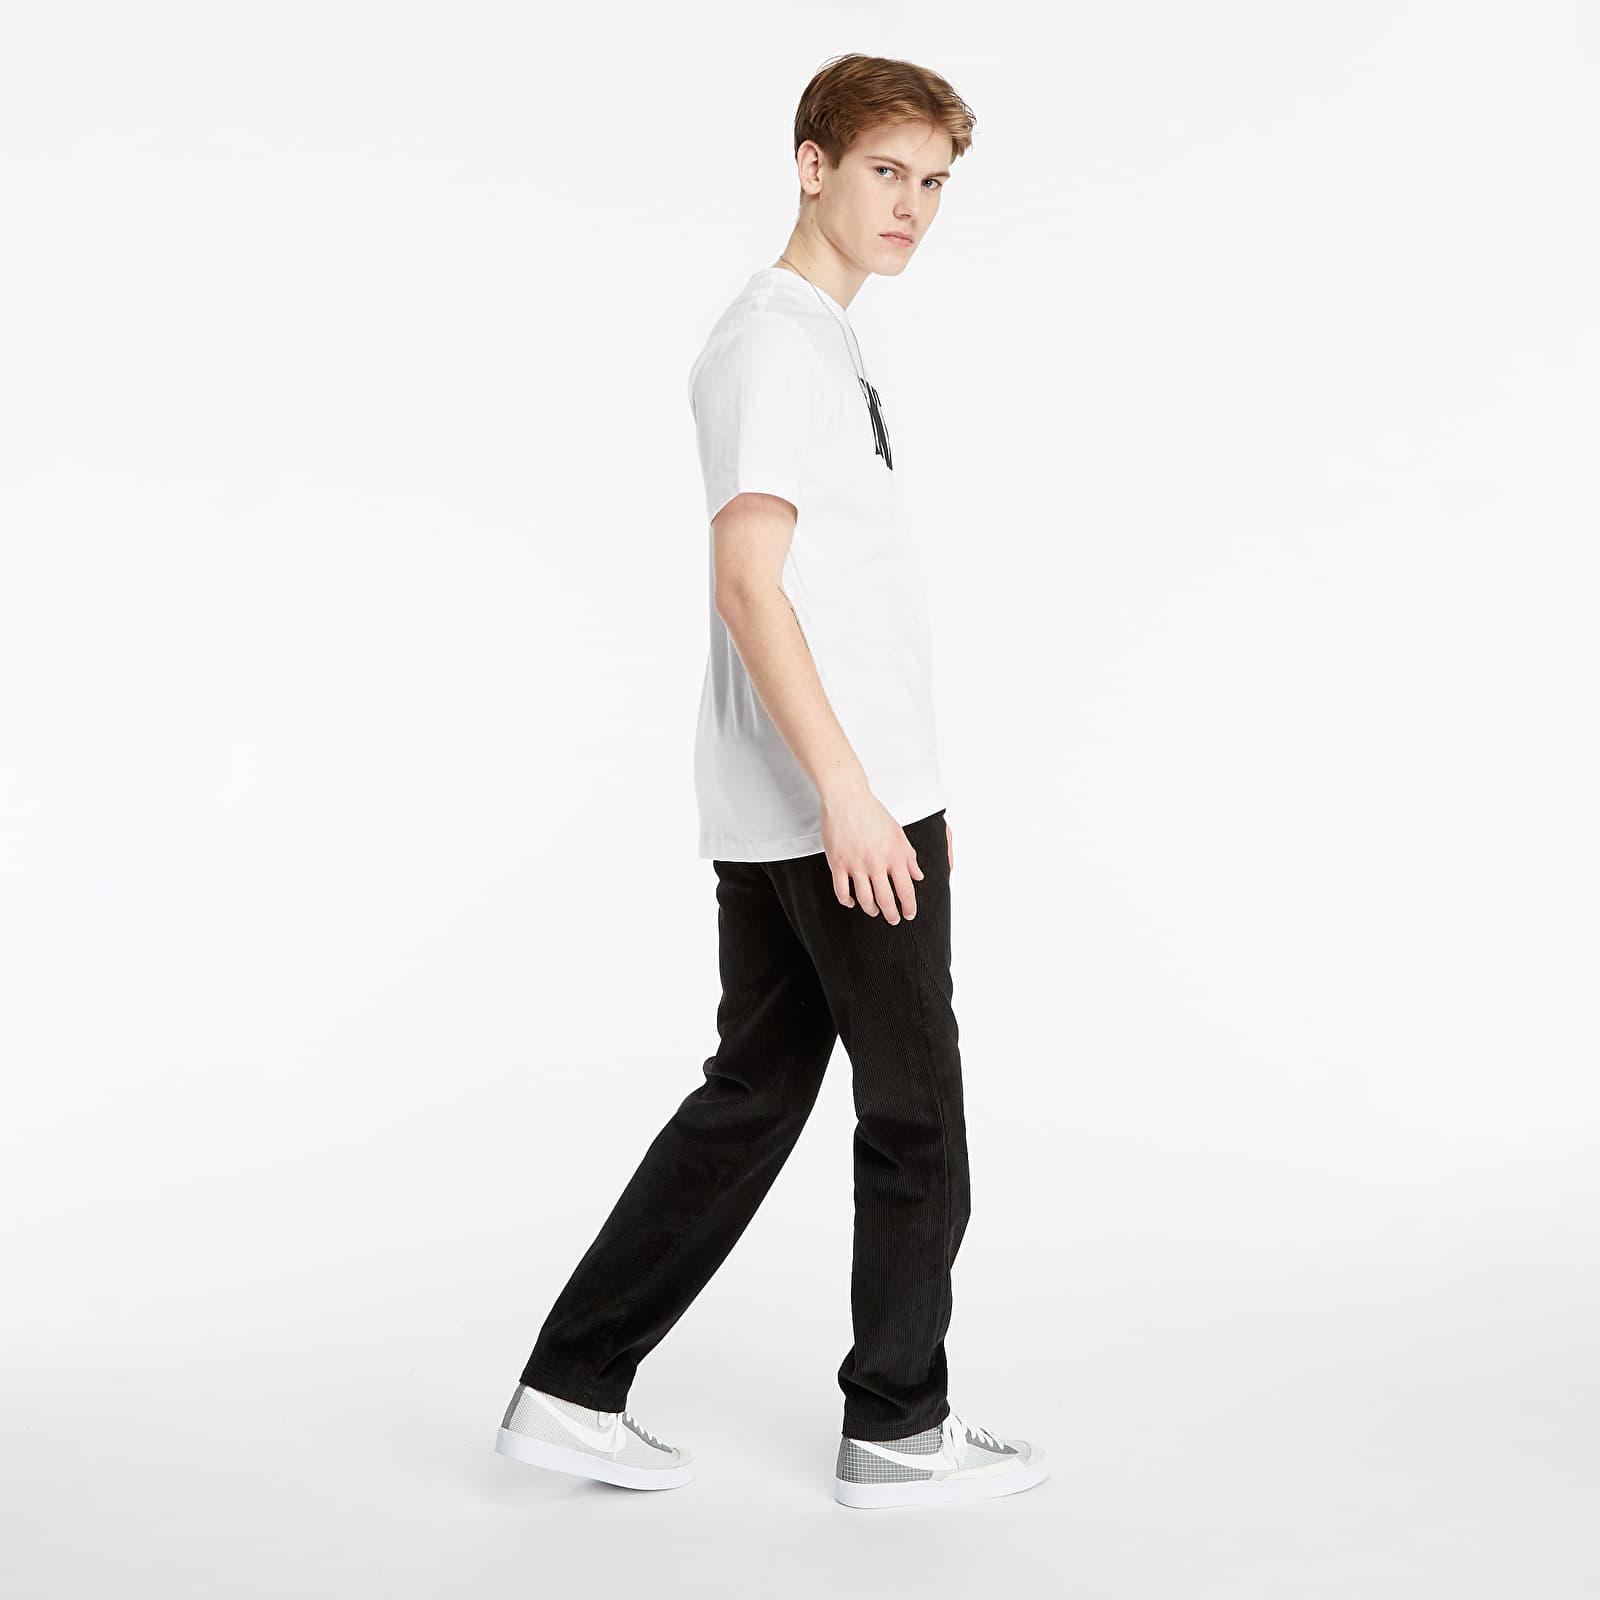 Nike Sportswear Tee Icon Nike Block White/ Black S